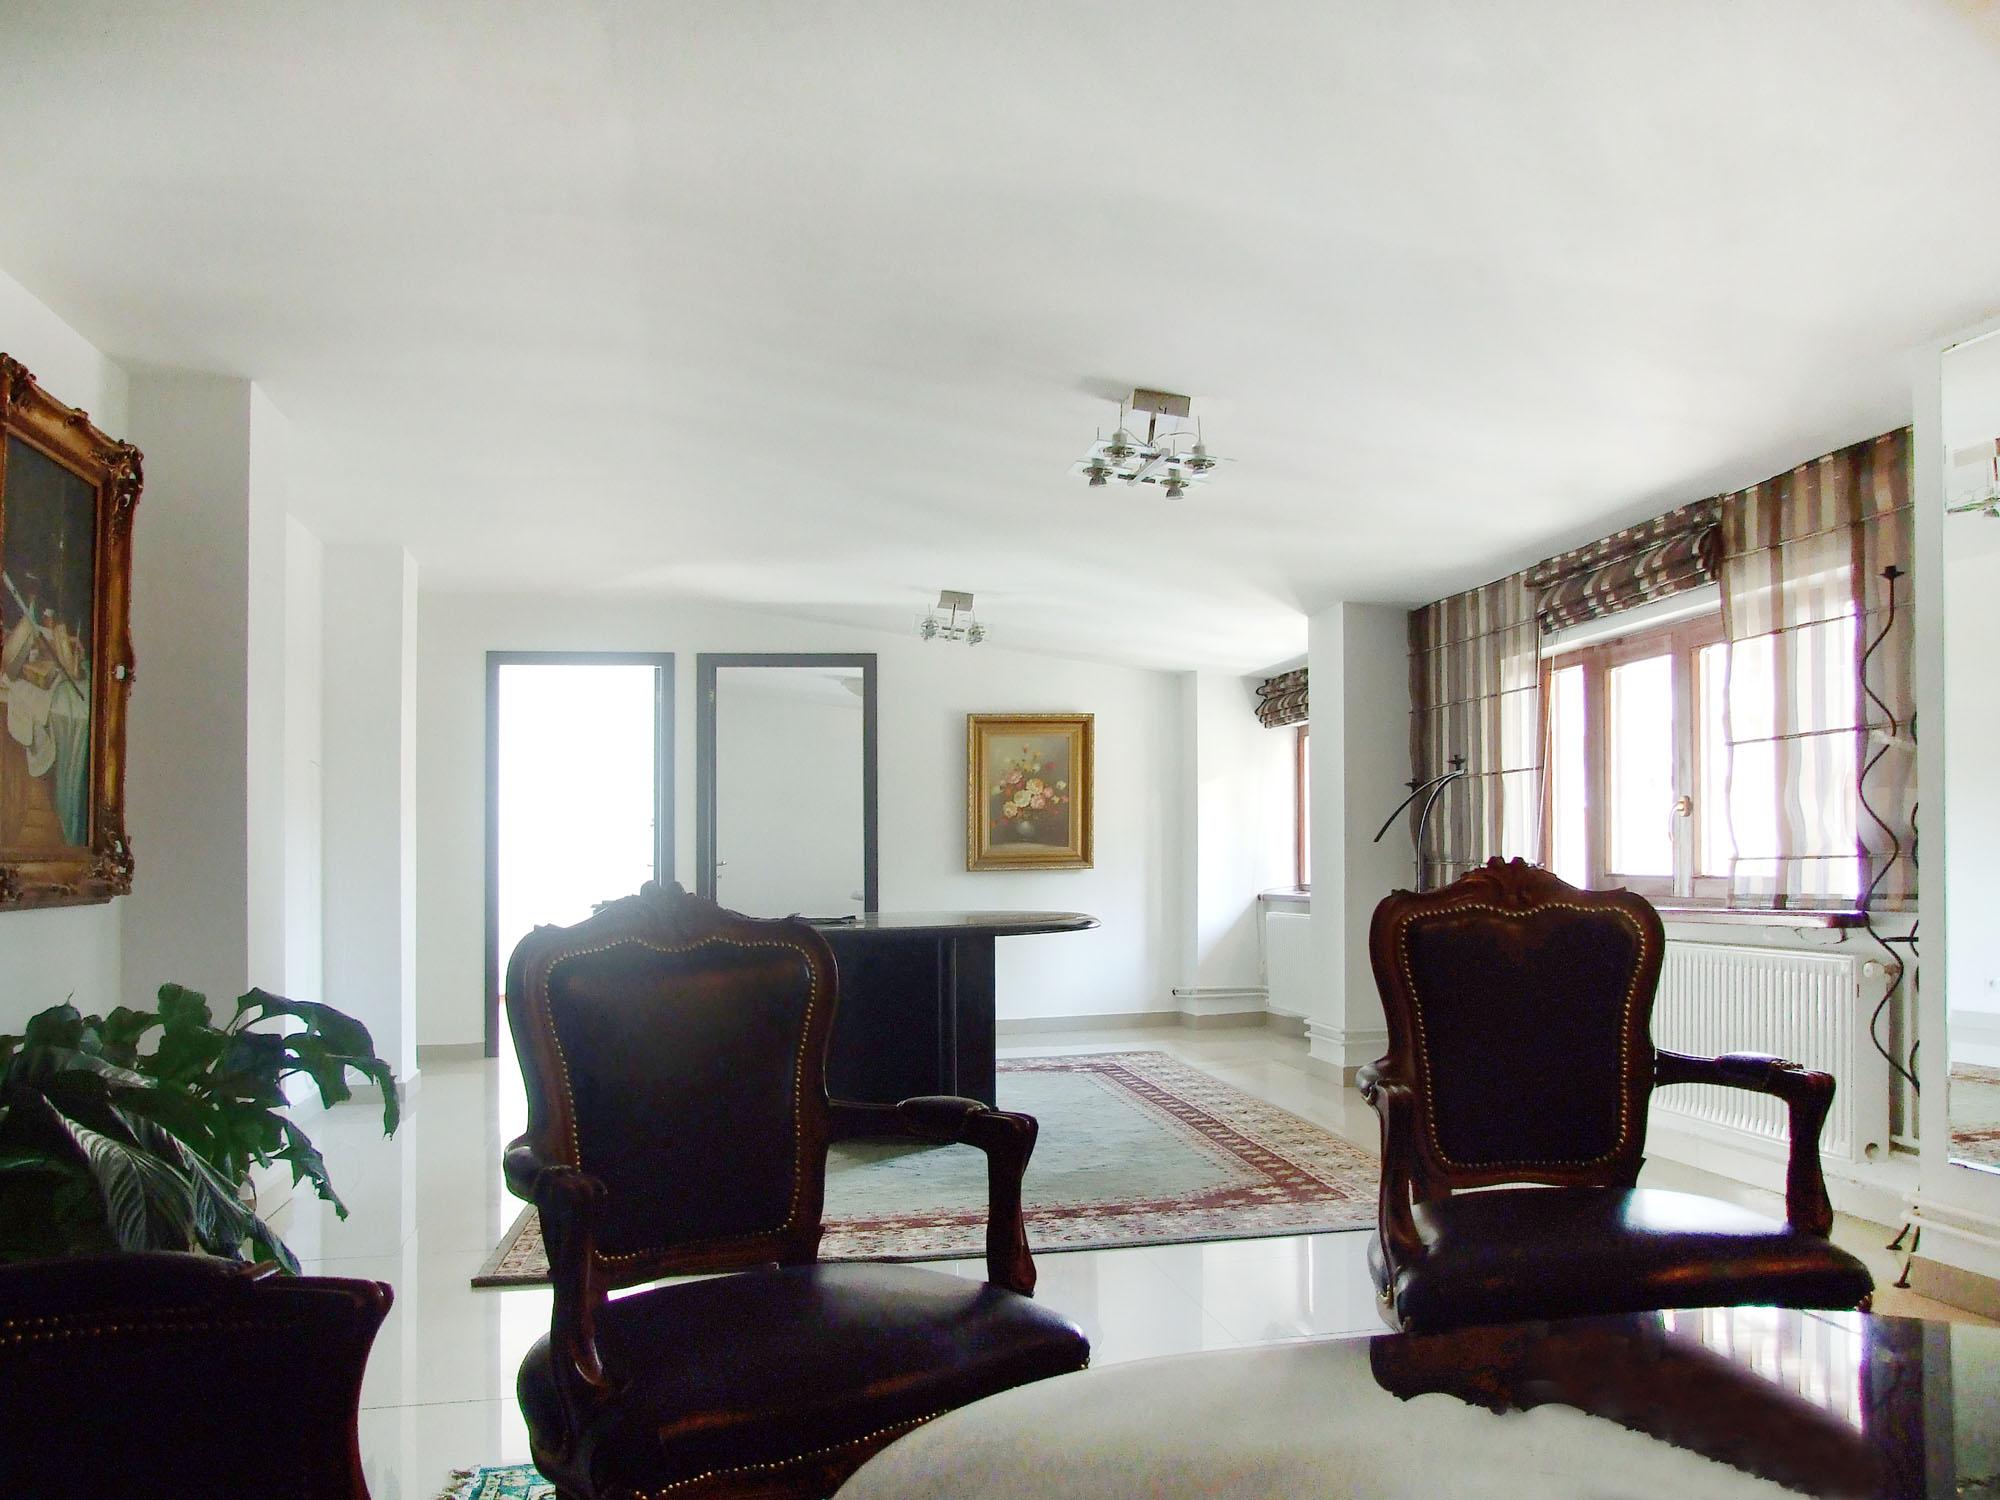 https://ahe-ro.s3.amazonaws.com/2854/casa_cu_ferestre_venetiene_2__1.jpg